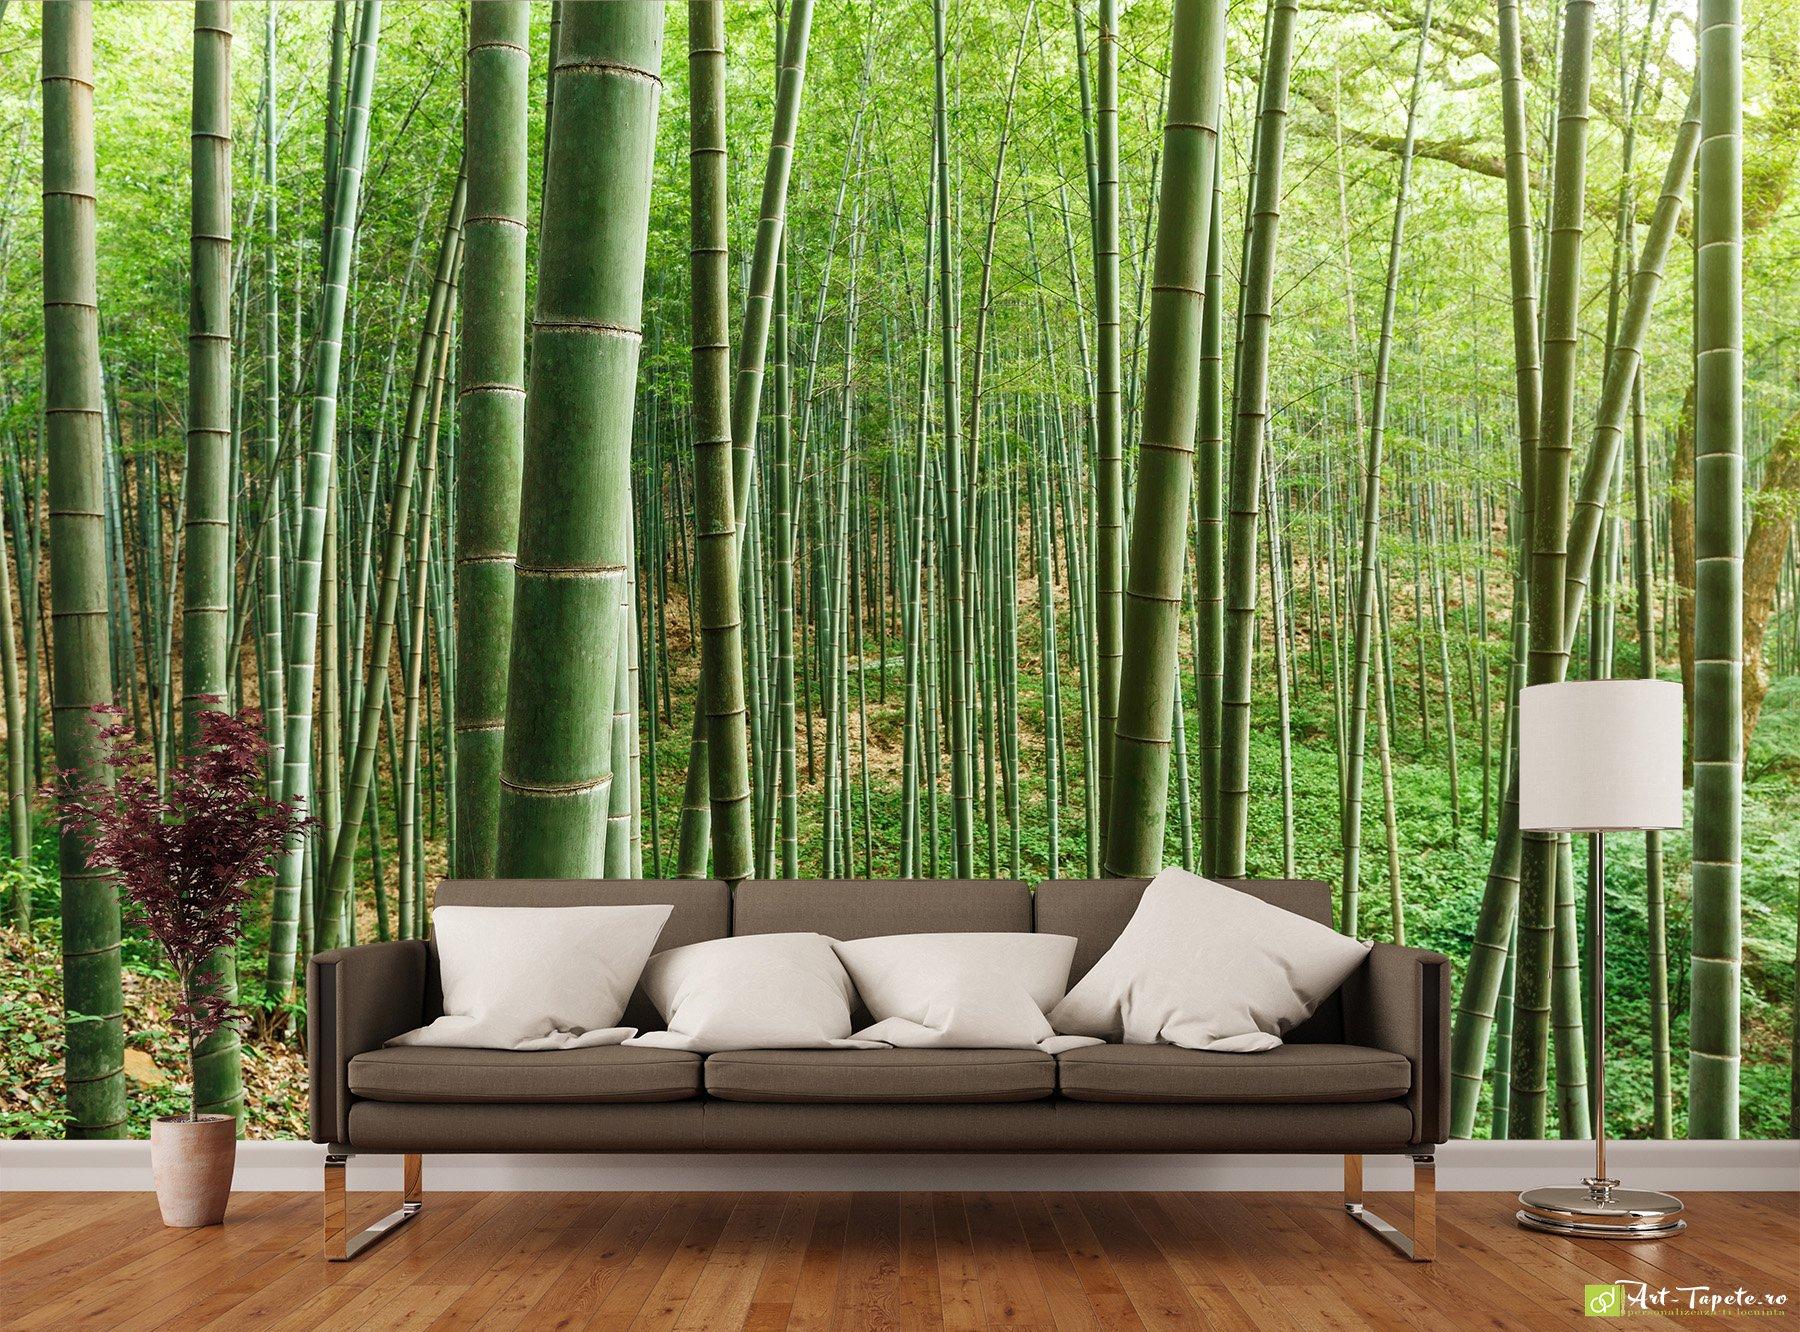 Wall Decor Tapet : Nature wallpaper wall murals bamboo forest